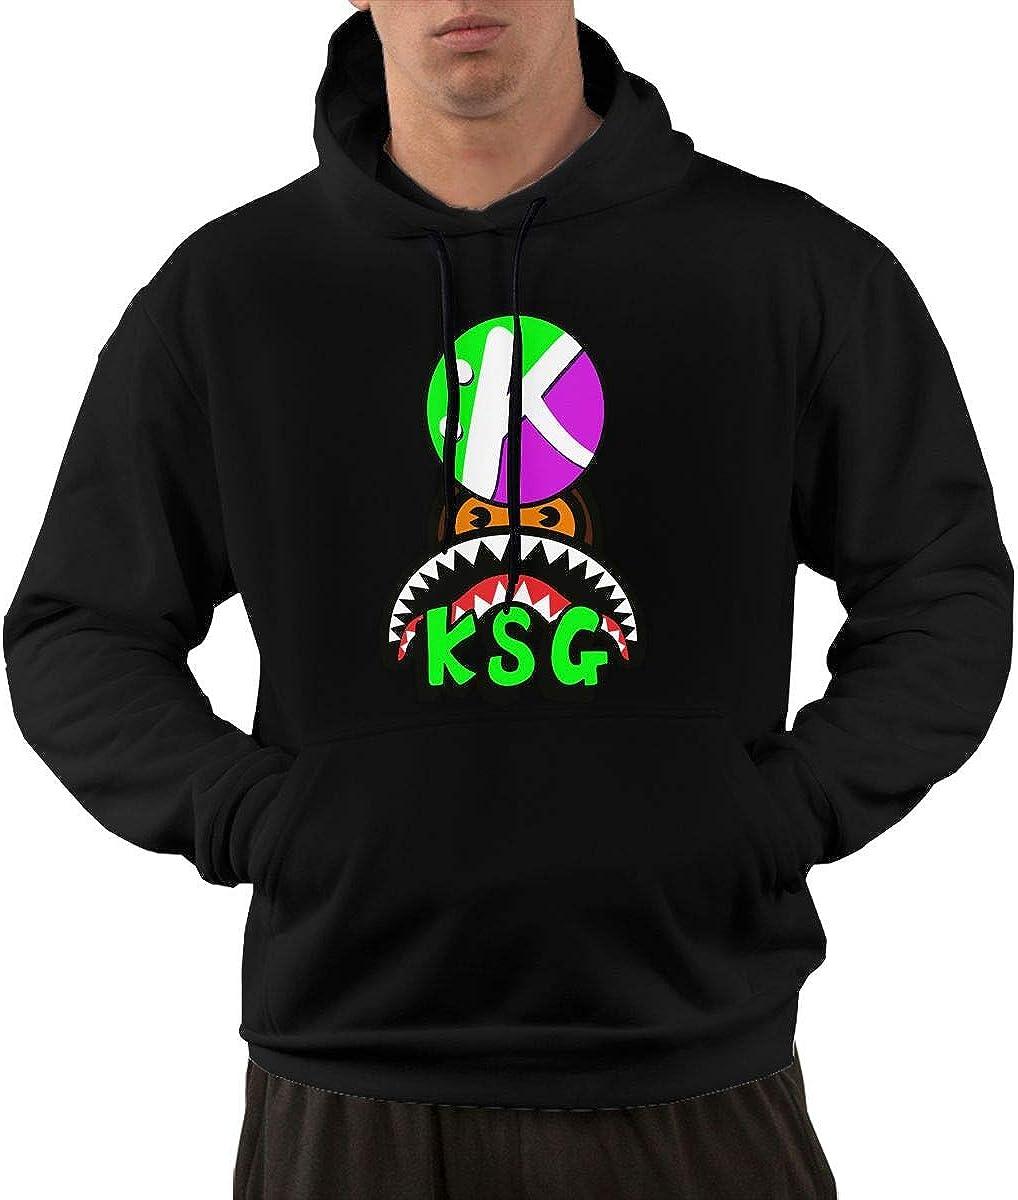 Iponvx KSG Hoodie Mens Casual Workout T-Shirt Hoodie